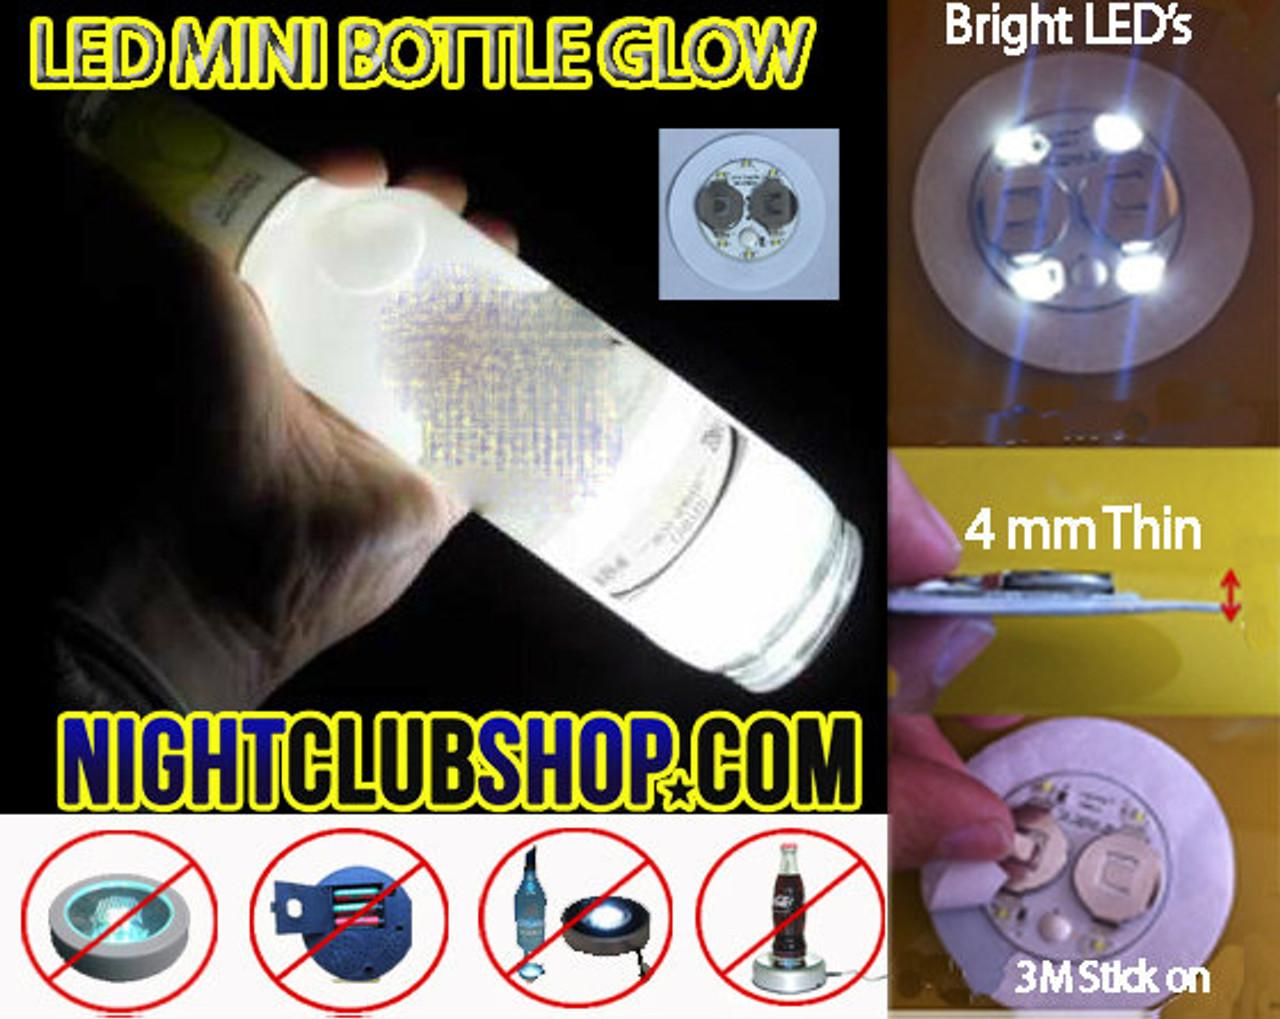 led,bottle,bright,lit,light up, illuminated, luminous, glasses,LED , BOTTLE GLORIFIER, BOTTLE, GLOW, BRIGHT, GLOWING, SPARX, NITE, NITESPARX,re-order, reorder, order, bulk, wholesale, restaurant, bar, nightclub, nite club, led, glory, glorify, glorifier, glowing, light, up, lit, illuminated, flashing, spark, glowy, bottella, illuminada, botella, luz, ordernar, Bottle Glow, LED BOTTLE, Discotec, drink, mix, creative, idea, Belvedere